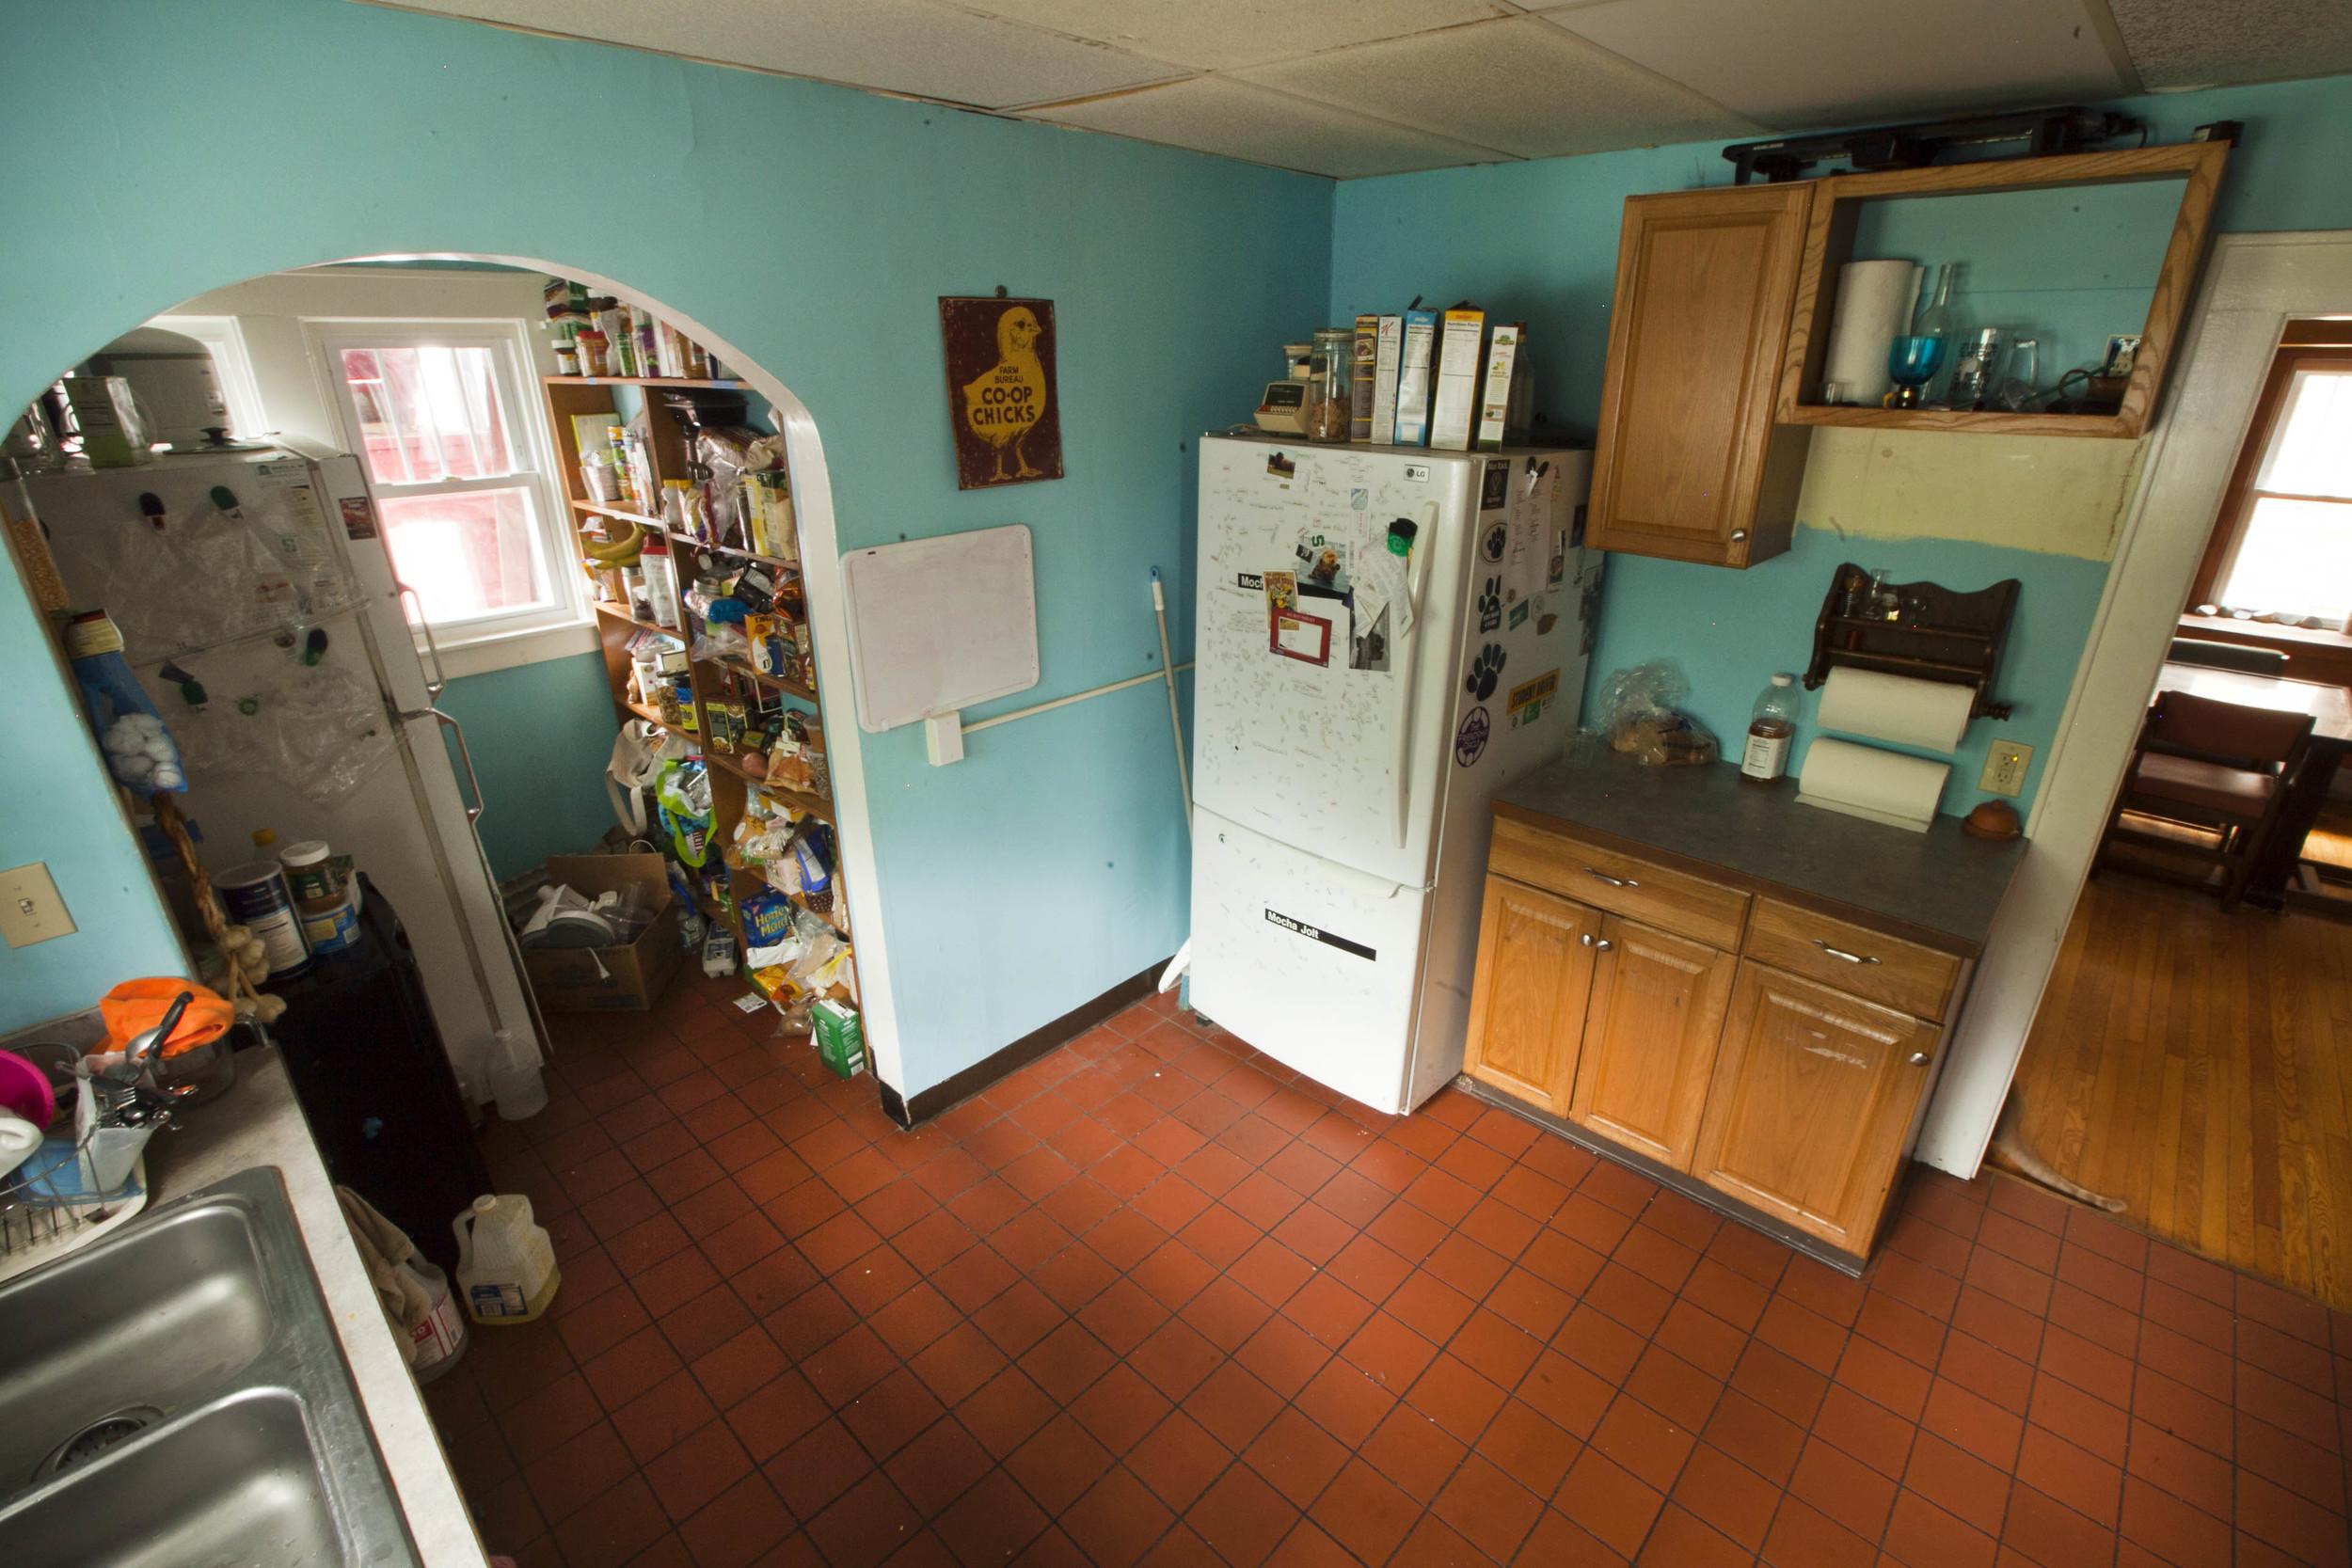 Ferency_Kitchen1.jpg